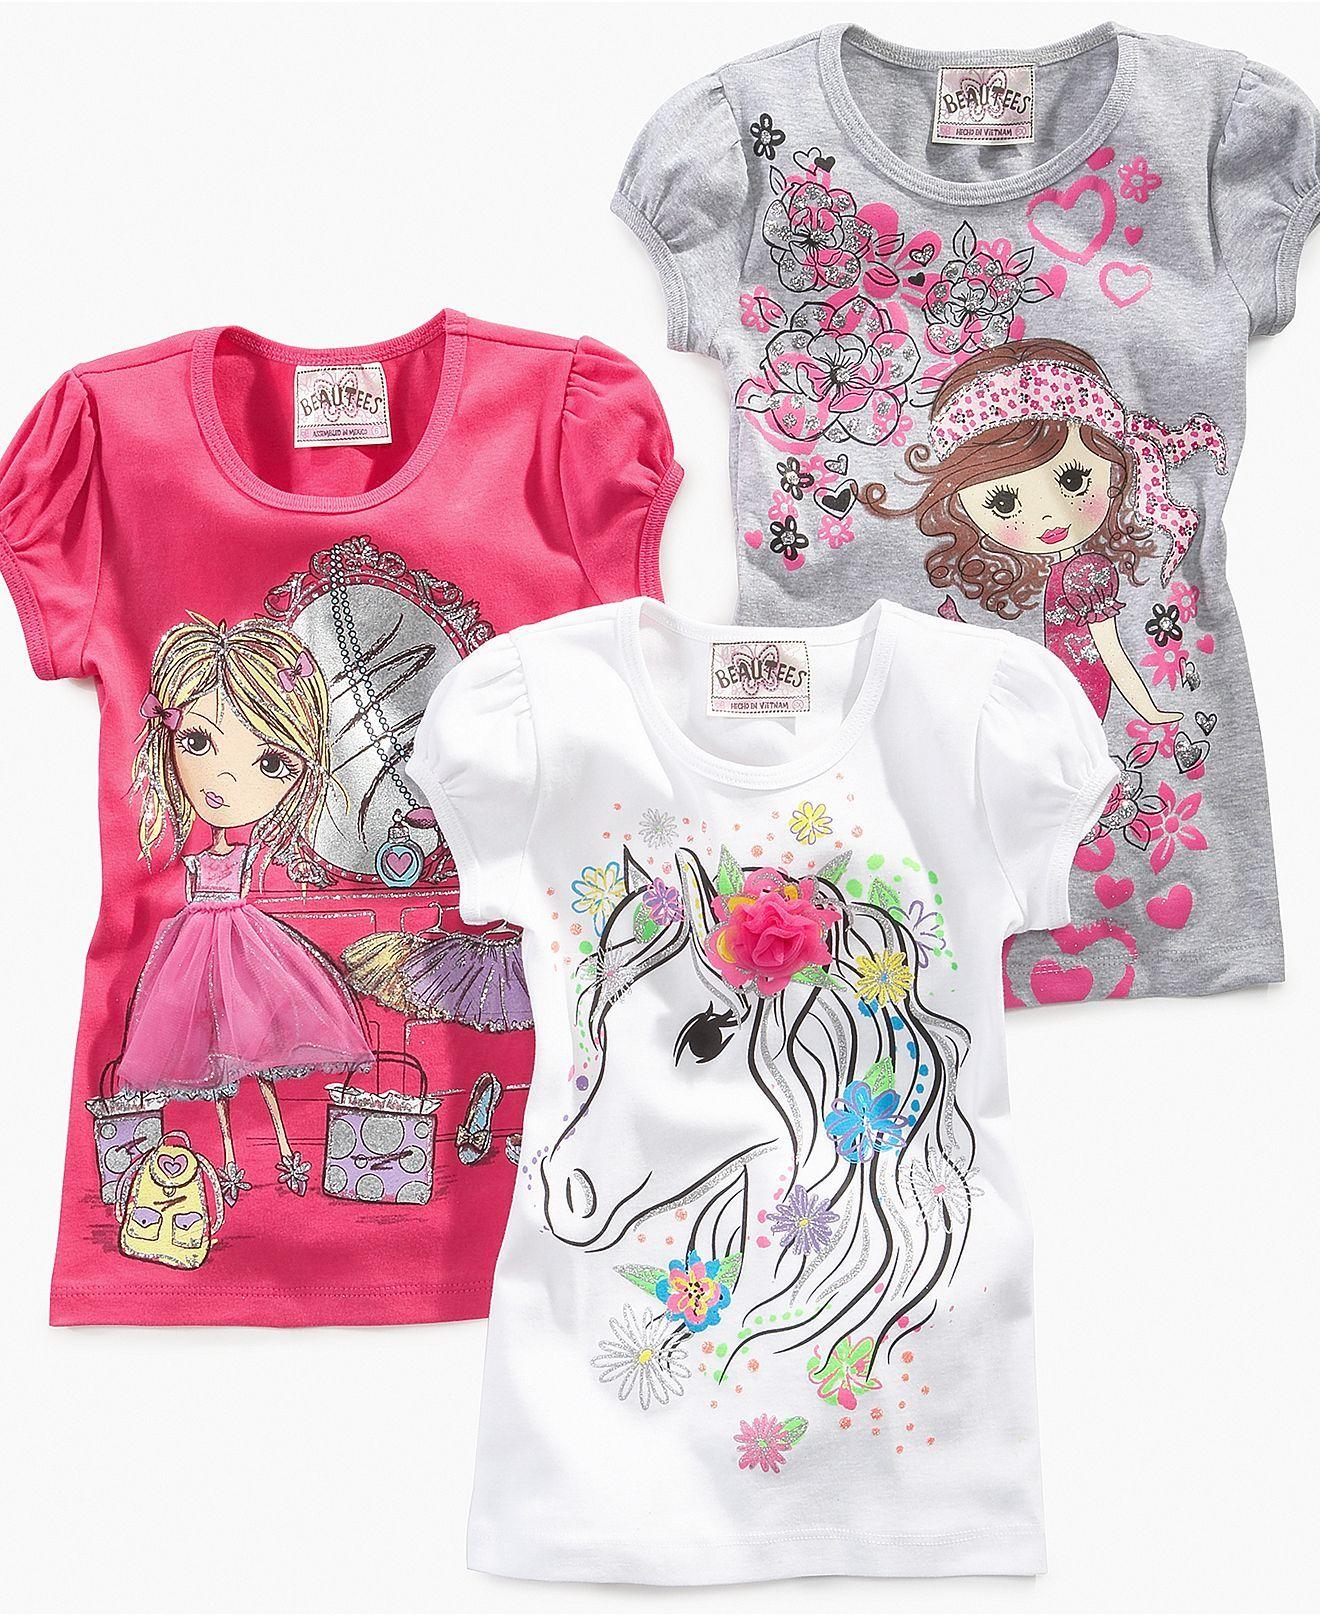 164fa9789 Beautees Kids Shirt, Little Girls Graphic Tee - Kids - Macy's ...